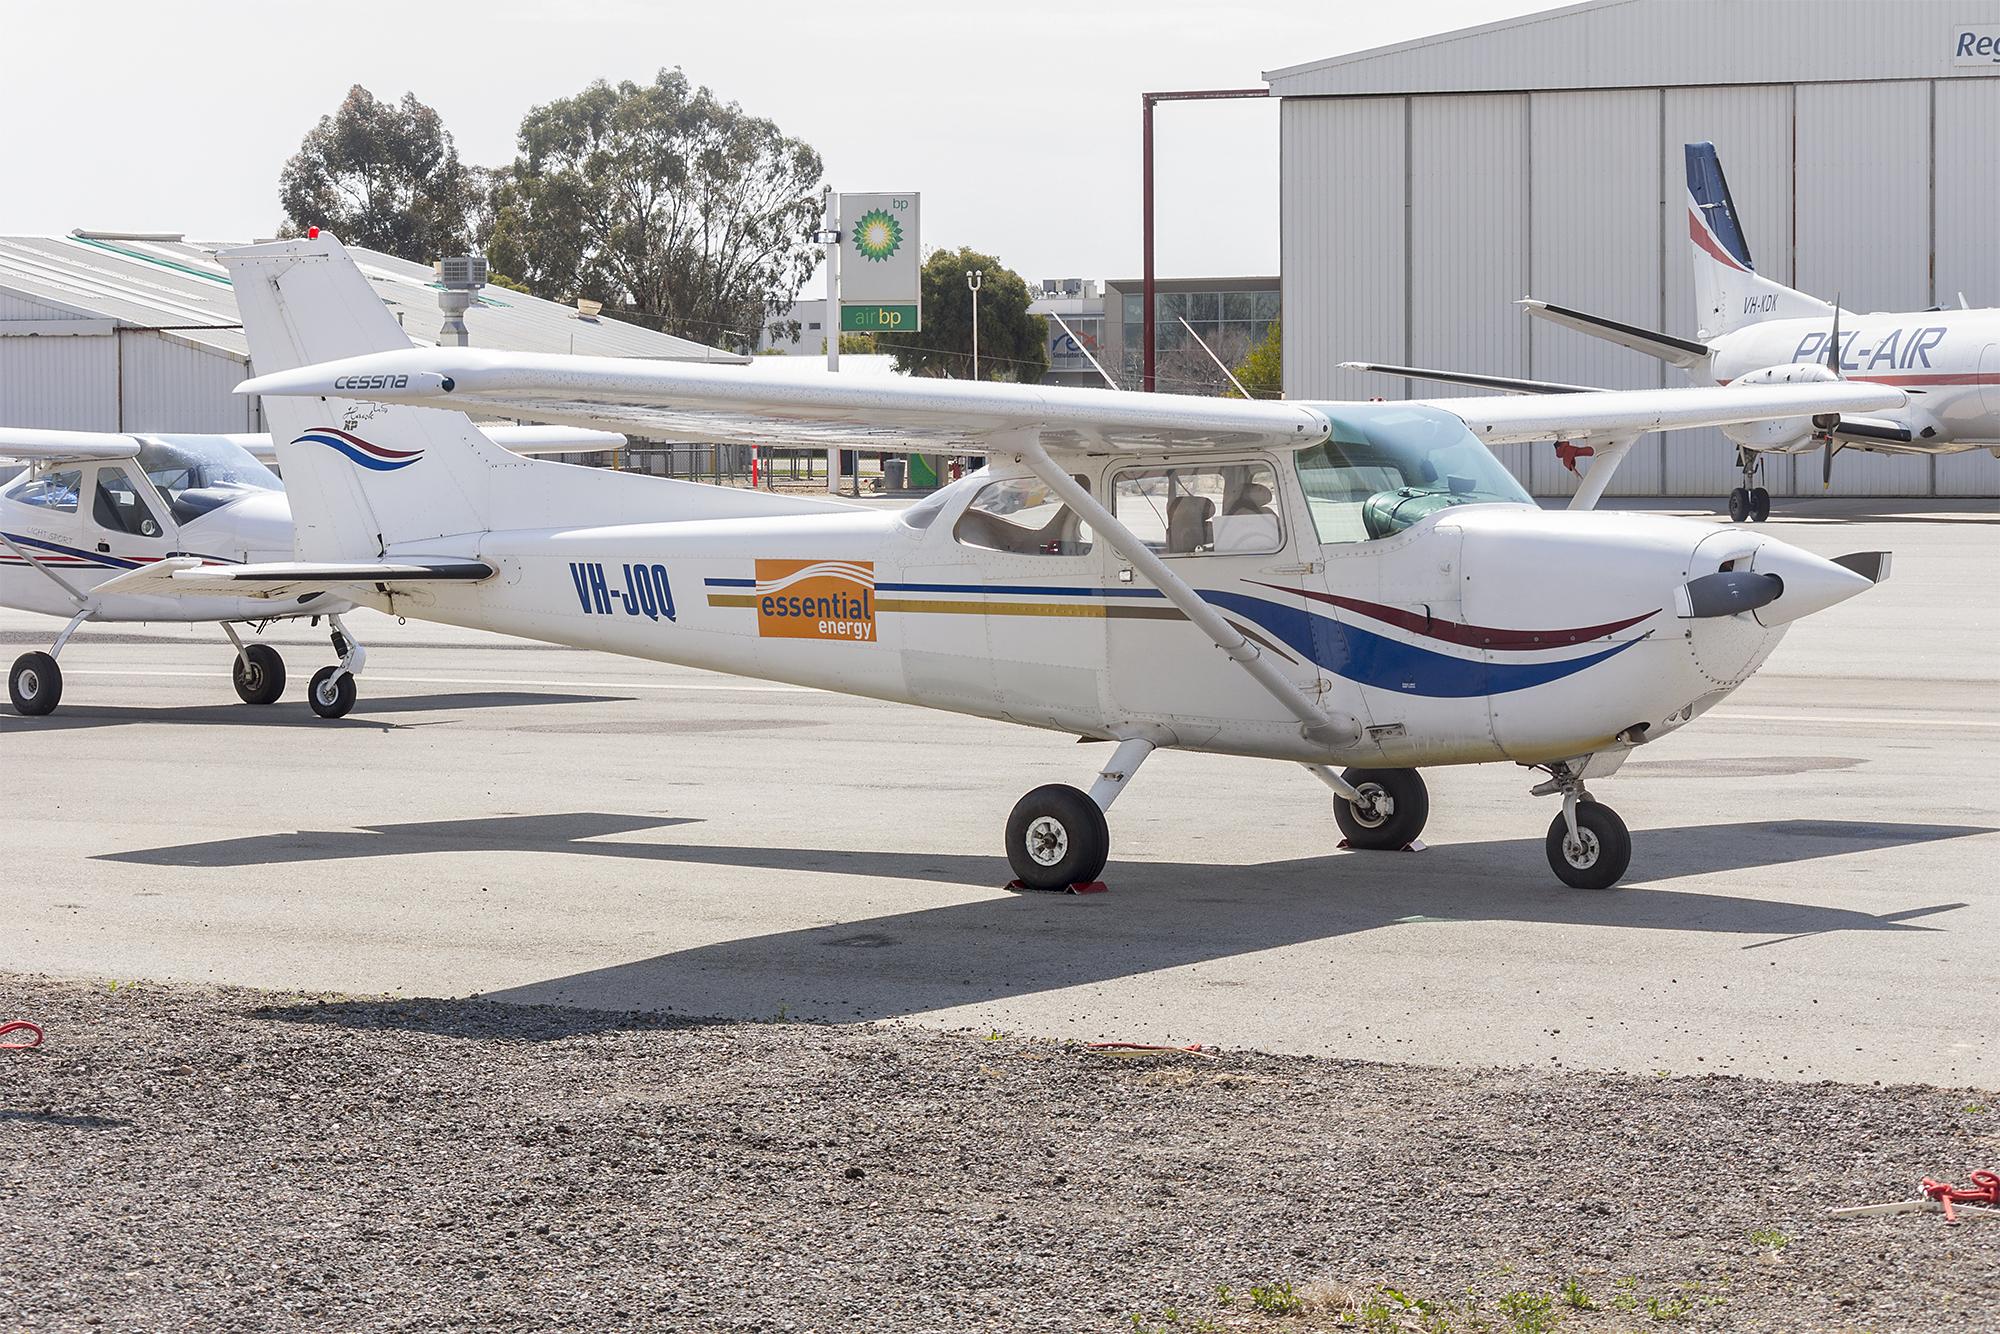 File:Oberon Aviation Services (VH-JQQ) Cessna R172K Hawk XP at Wagga